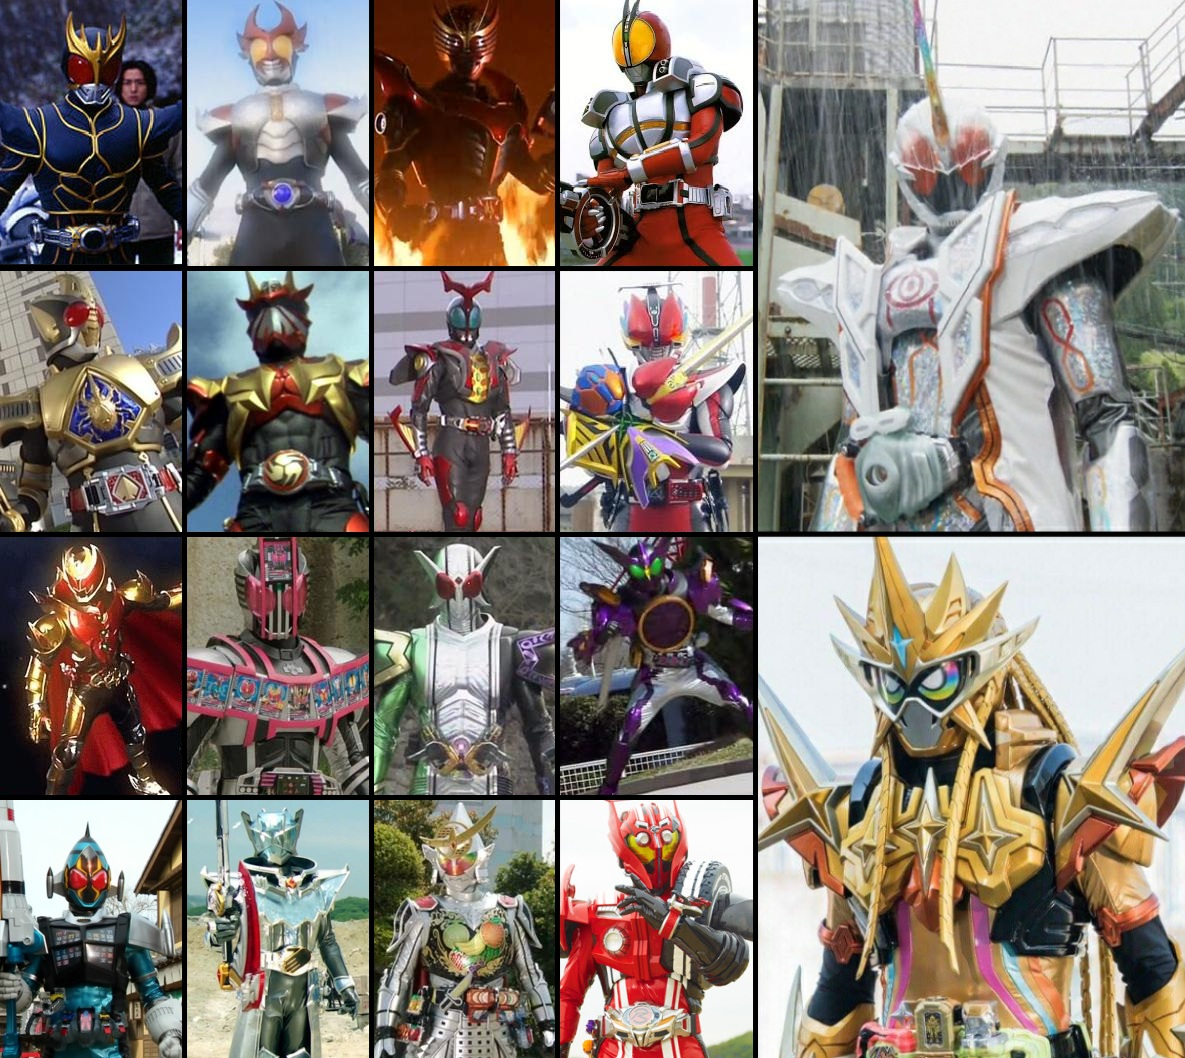 Morphenomenal Awesomeness: Kamen Rider Final Forms